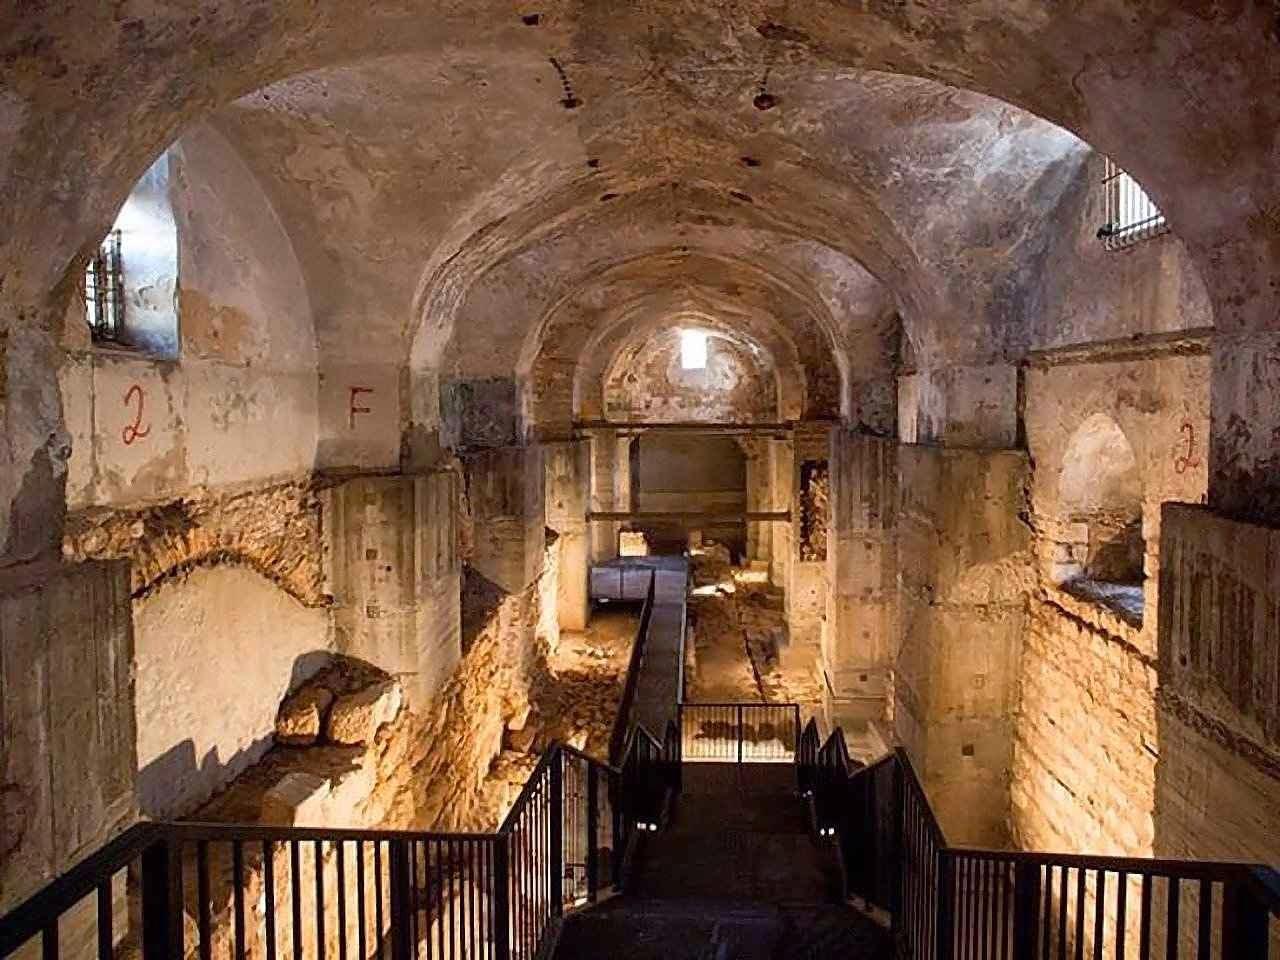 Neste complexo hoje soterrado poderia ter acontecido o julgamento de Jesus, segundo os arqueólogos  (Foto: Oded Antman, Ministério israelense de Turismo).